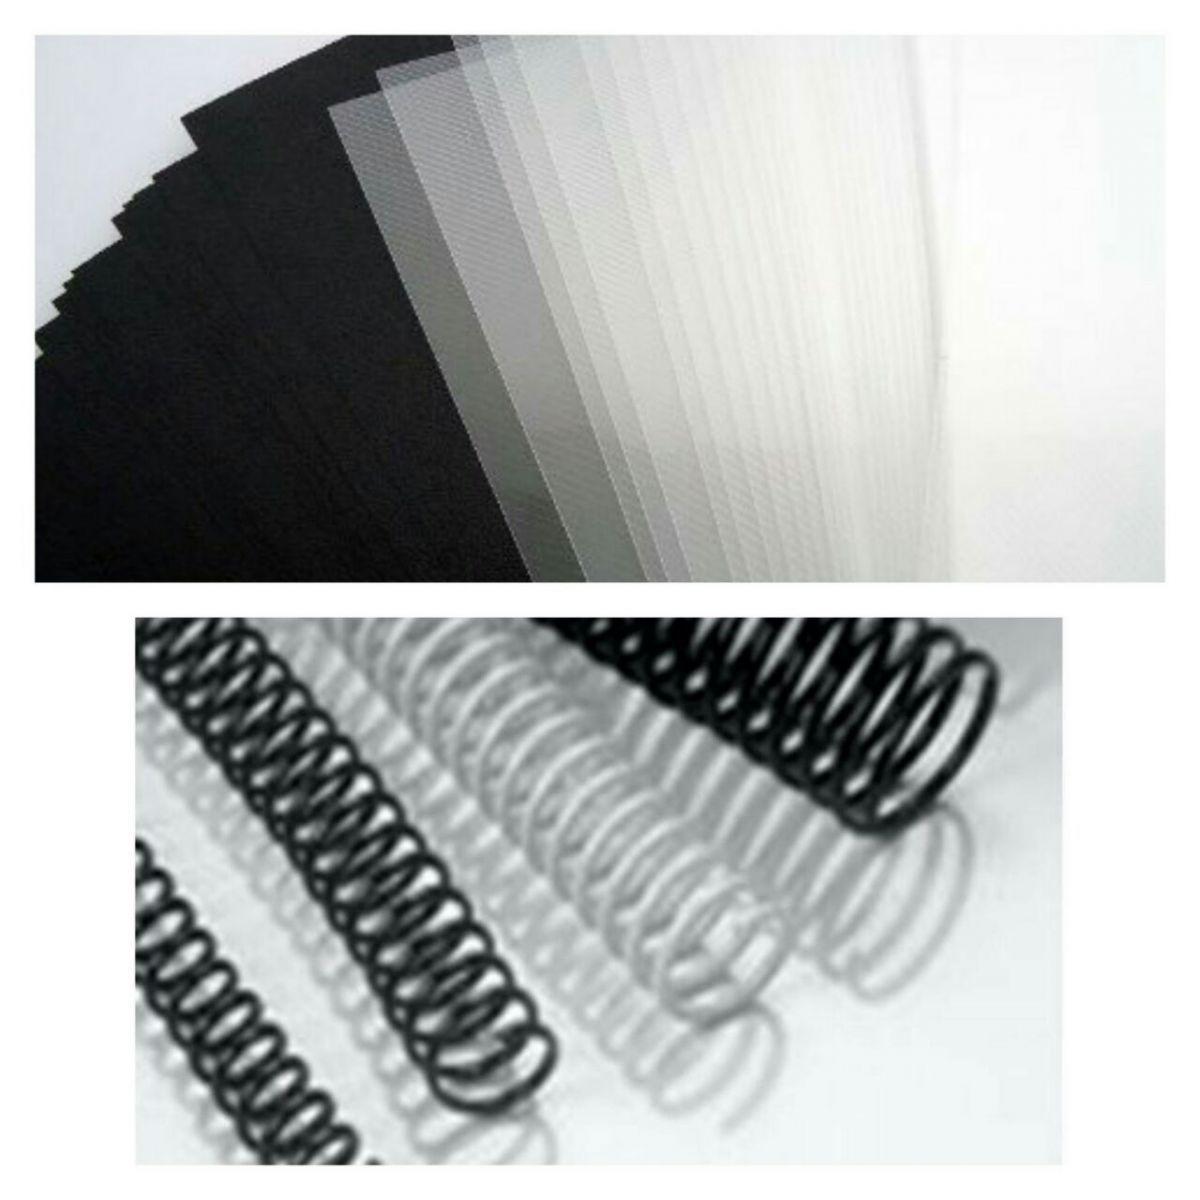 Kit Plastificadora Encadernadora Guilhotina e Todo Material Excentrix  - Click Suprimentos